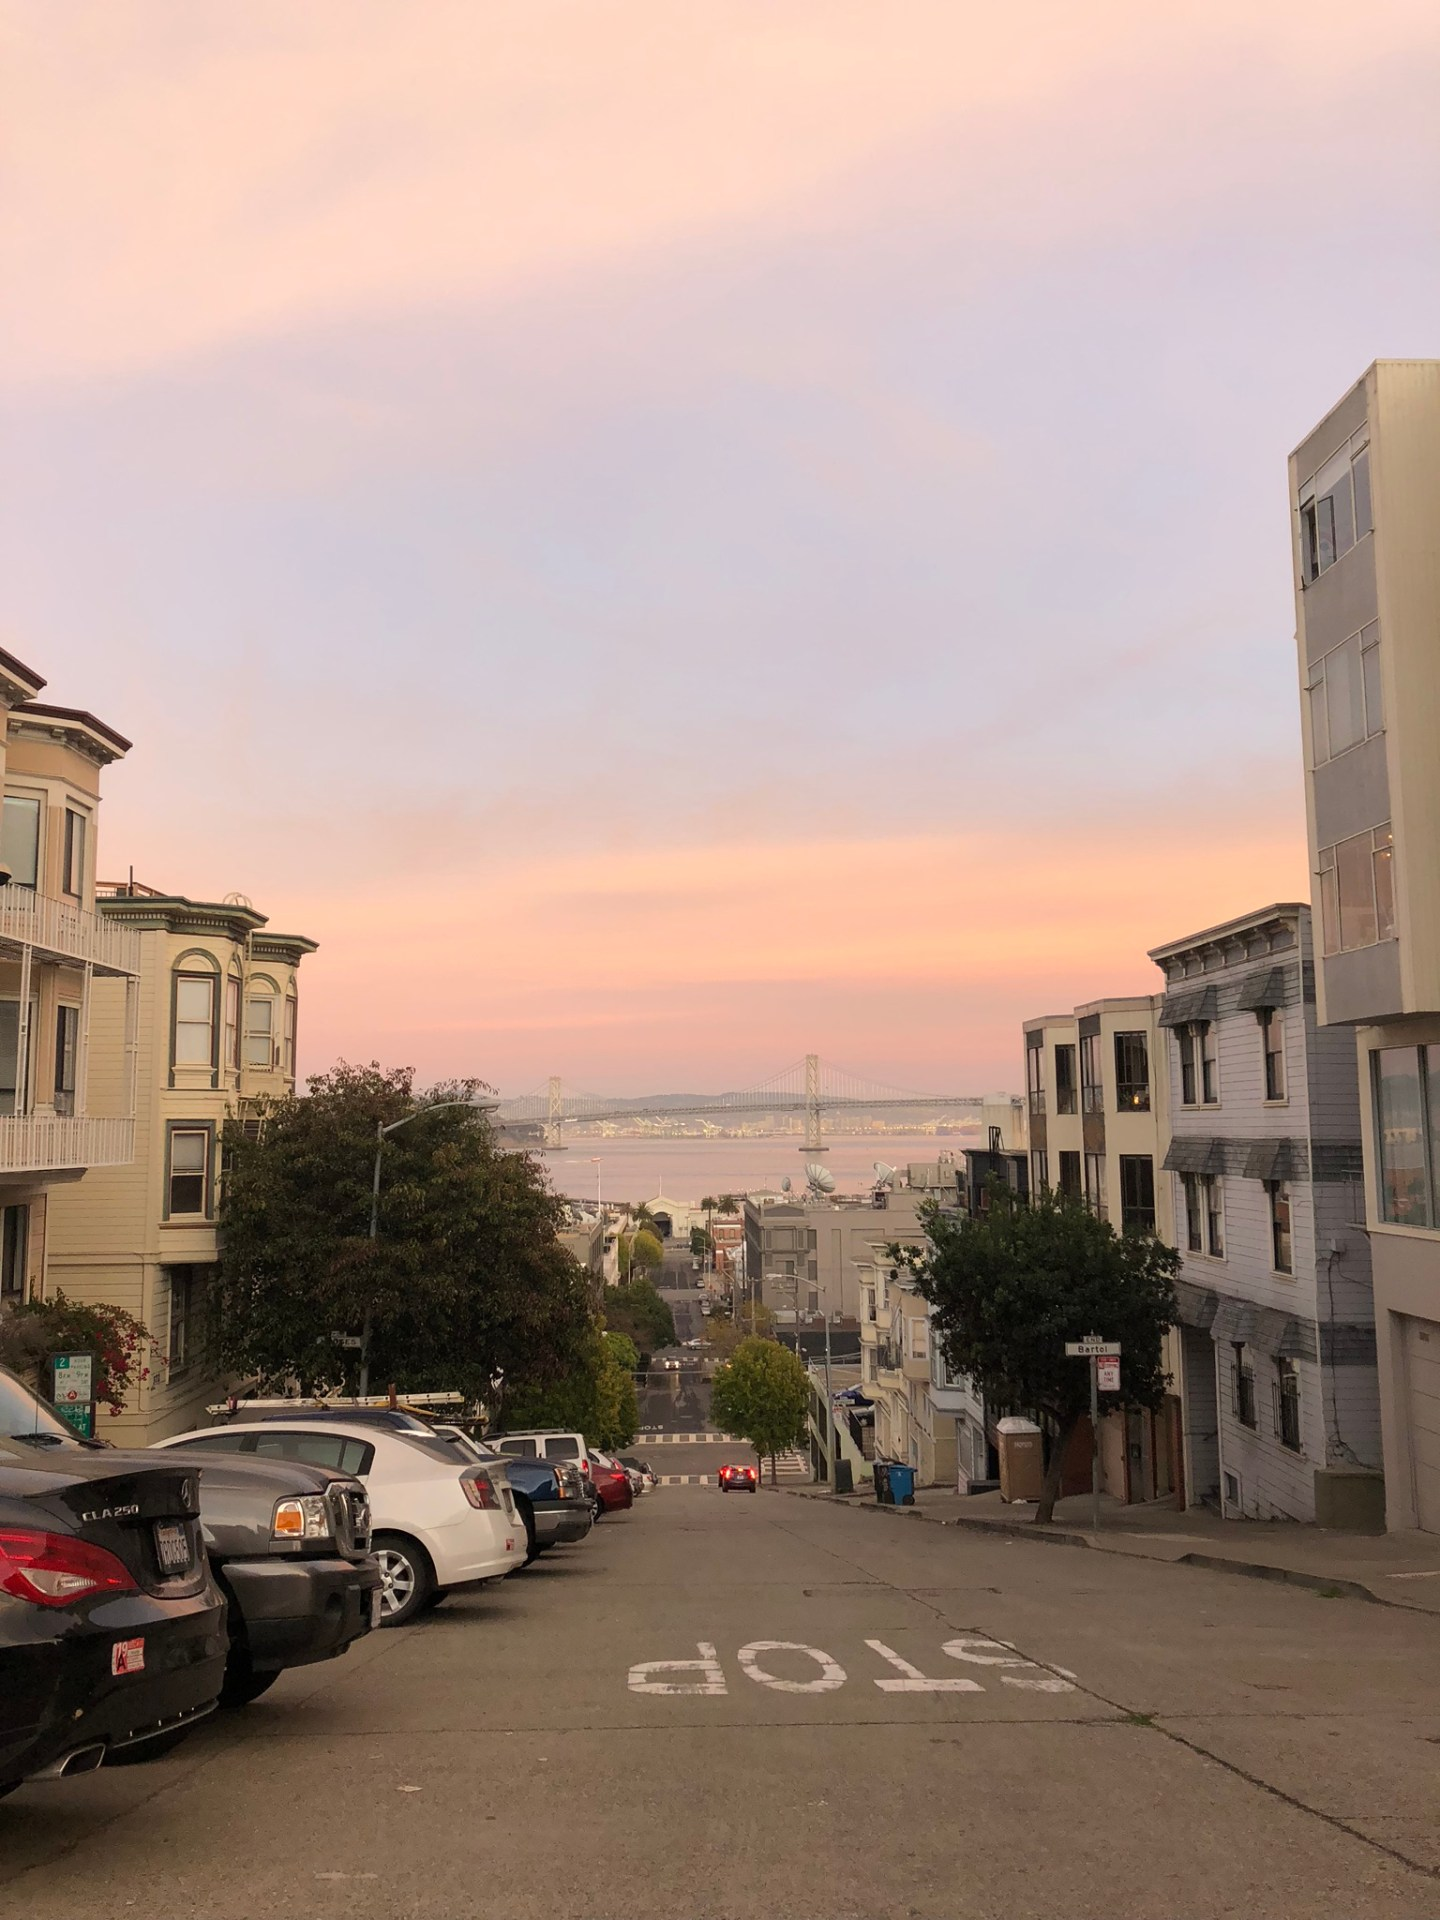 Sunsets across San Francisco Bay